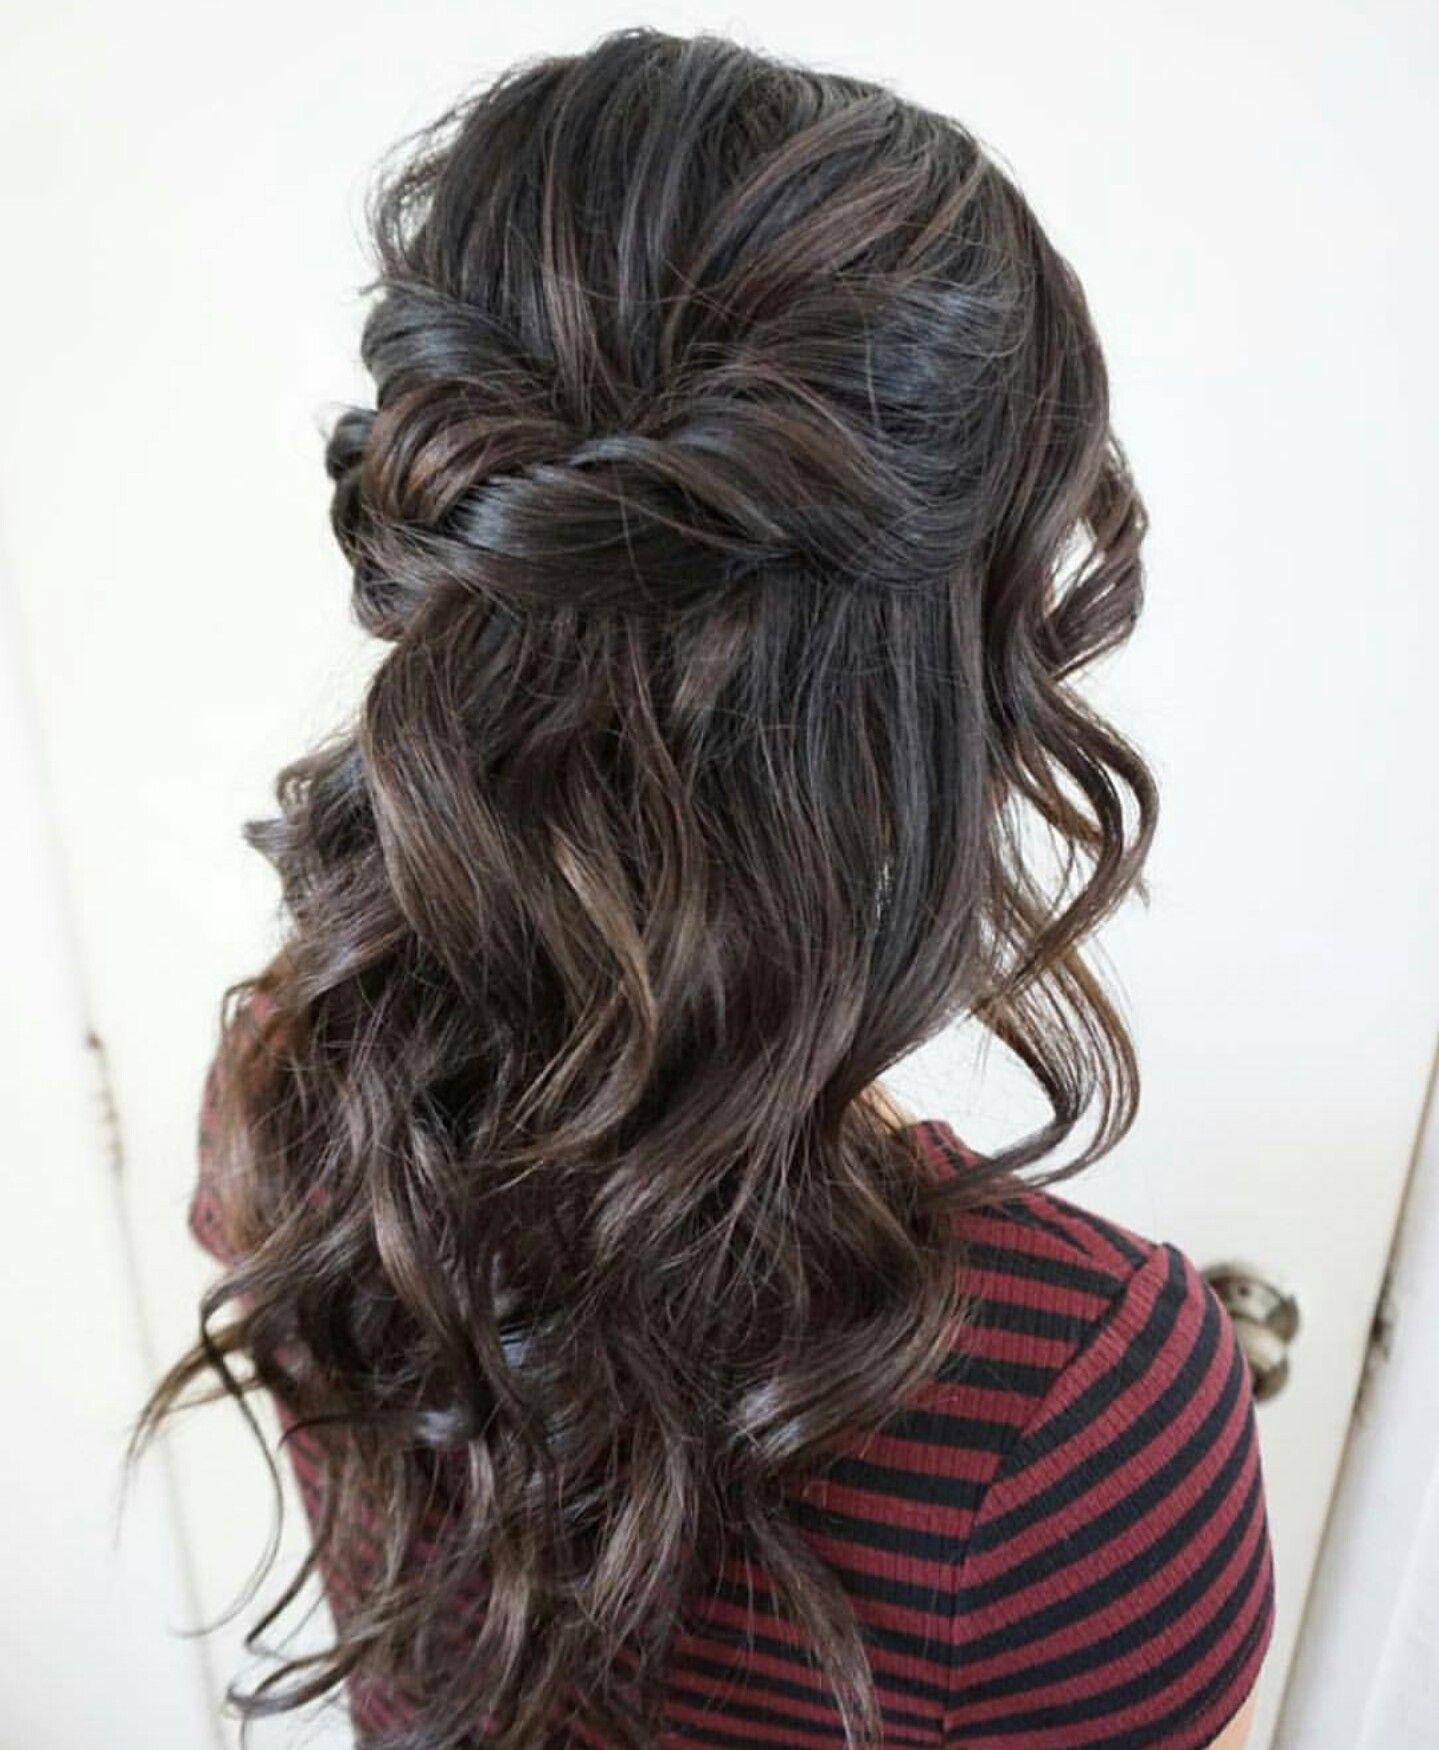 Pin by Eva Hawk on Hair | Pinterest | Wedding Hairstyles ...